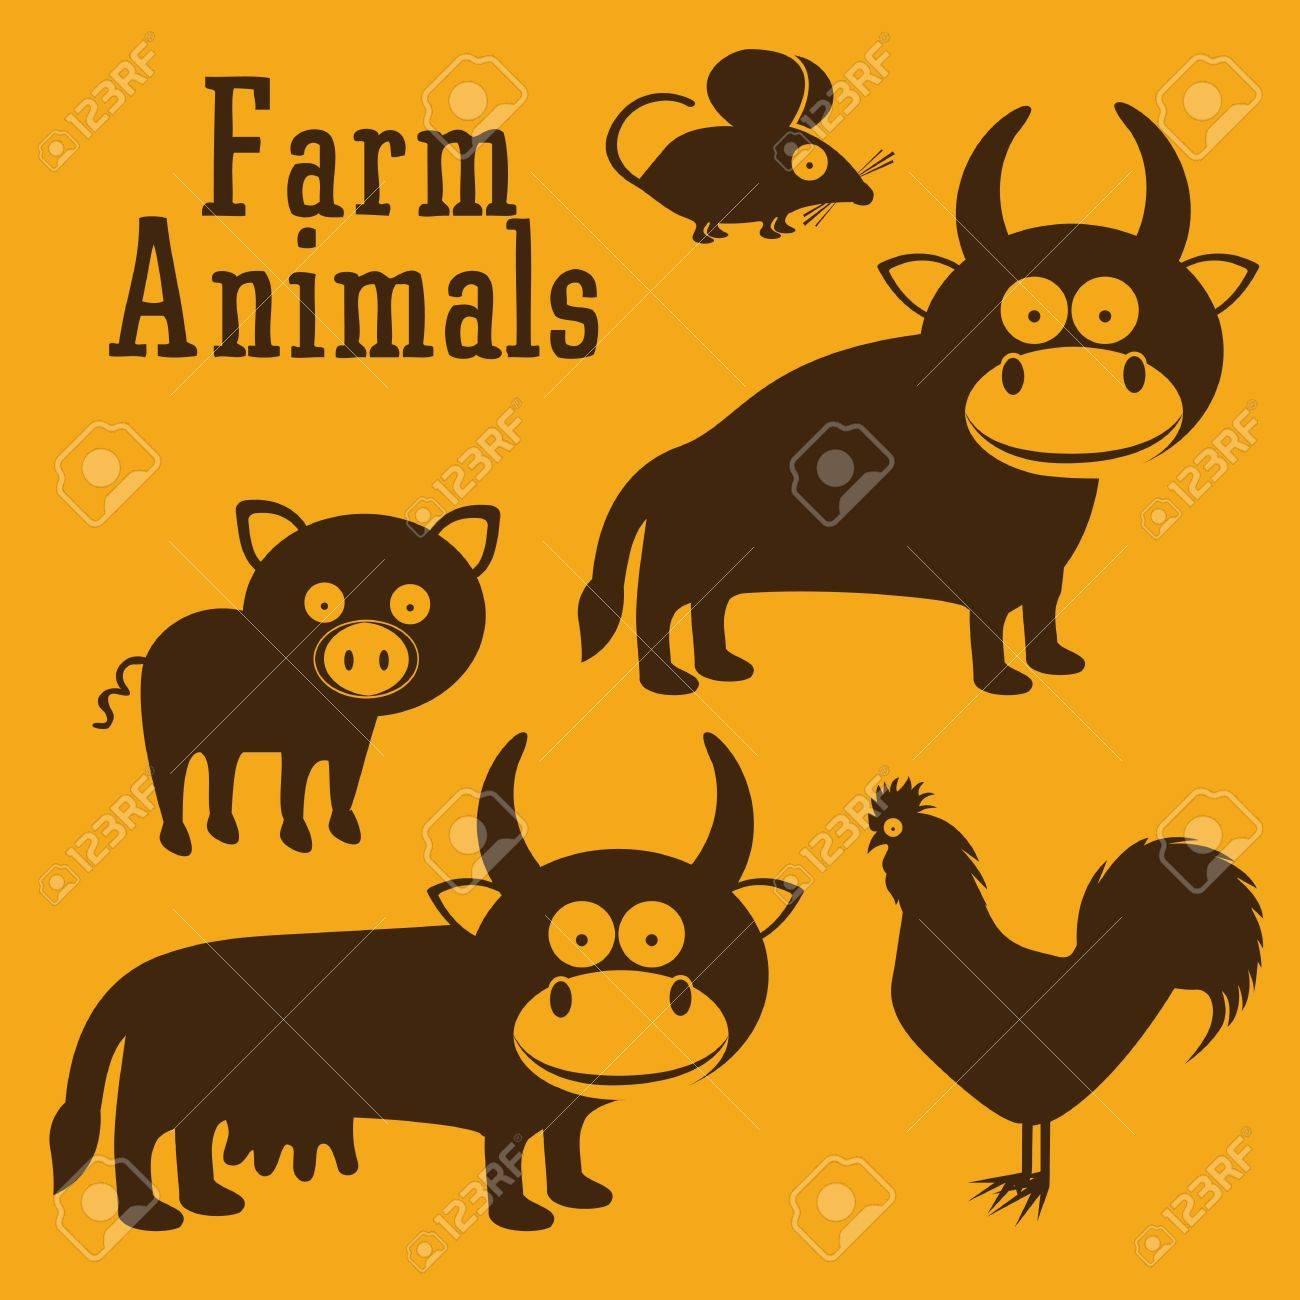 Illustration of Cute Animals. Farm Animals Icons. vector illustration Stock Vector - 17888710